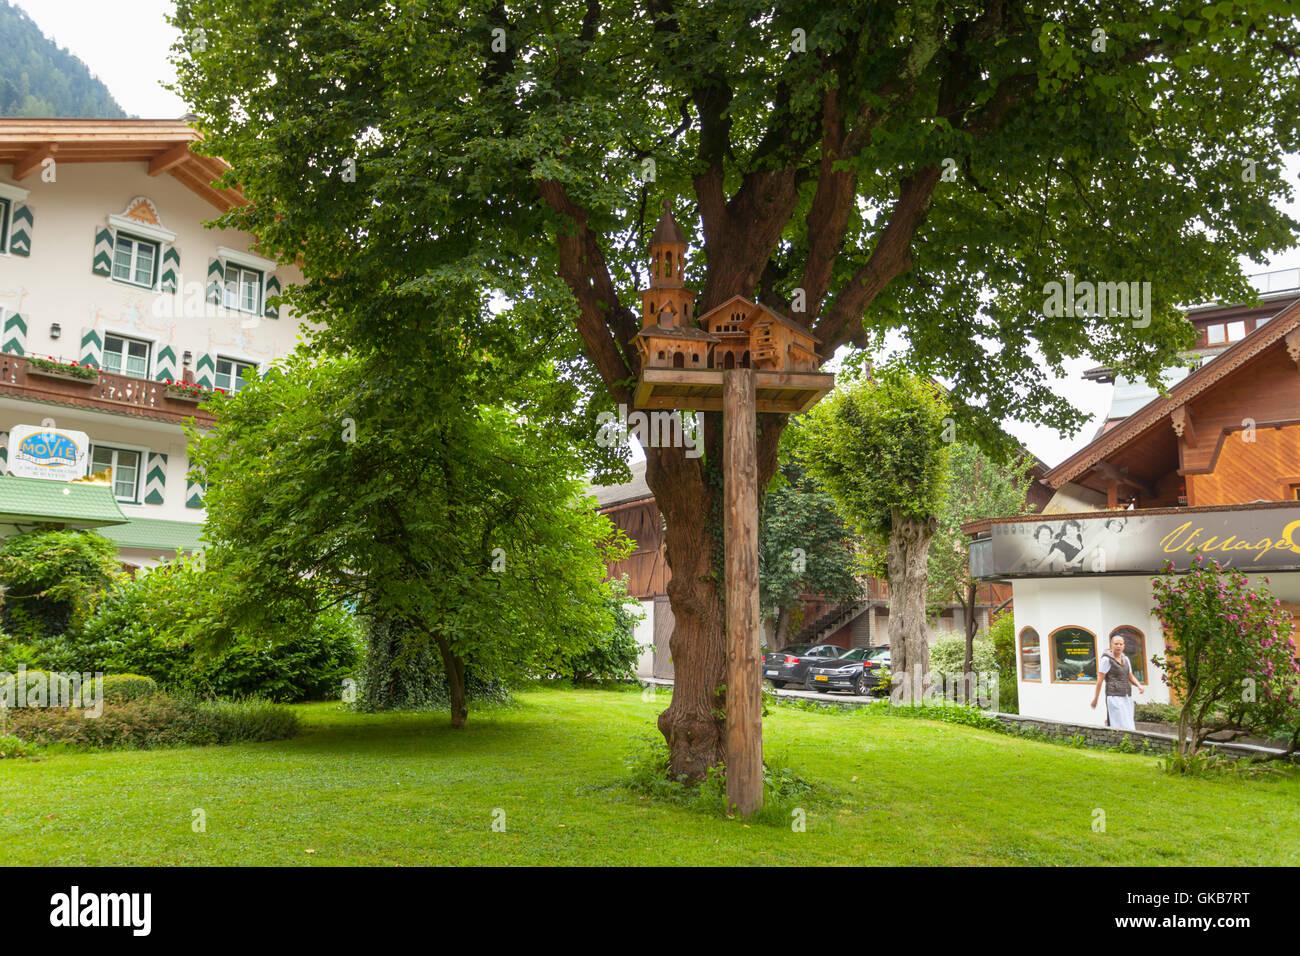 Wooden birdhouse near a tree in Mayrhofen, Austria - Stock Image